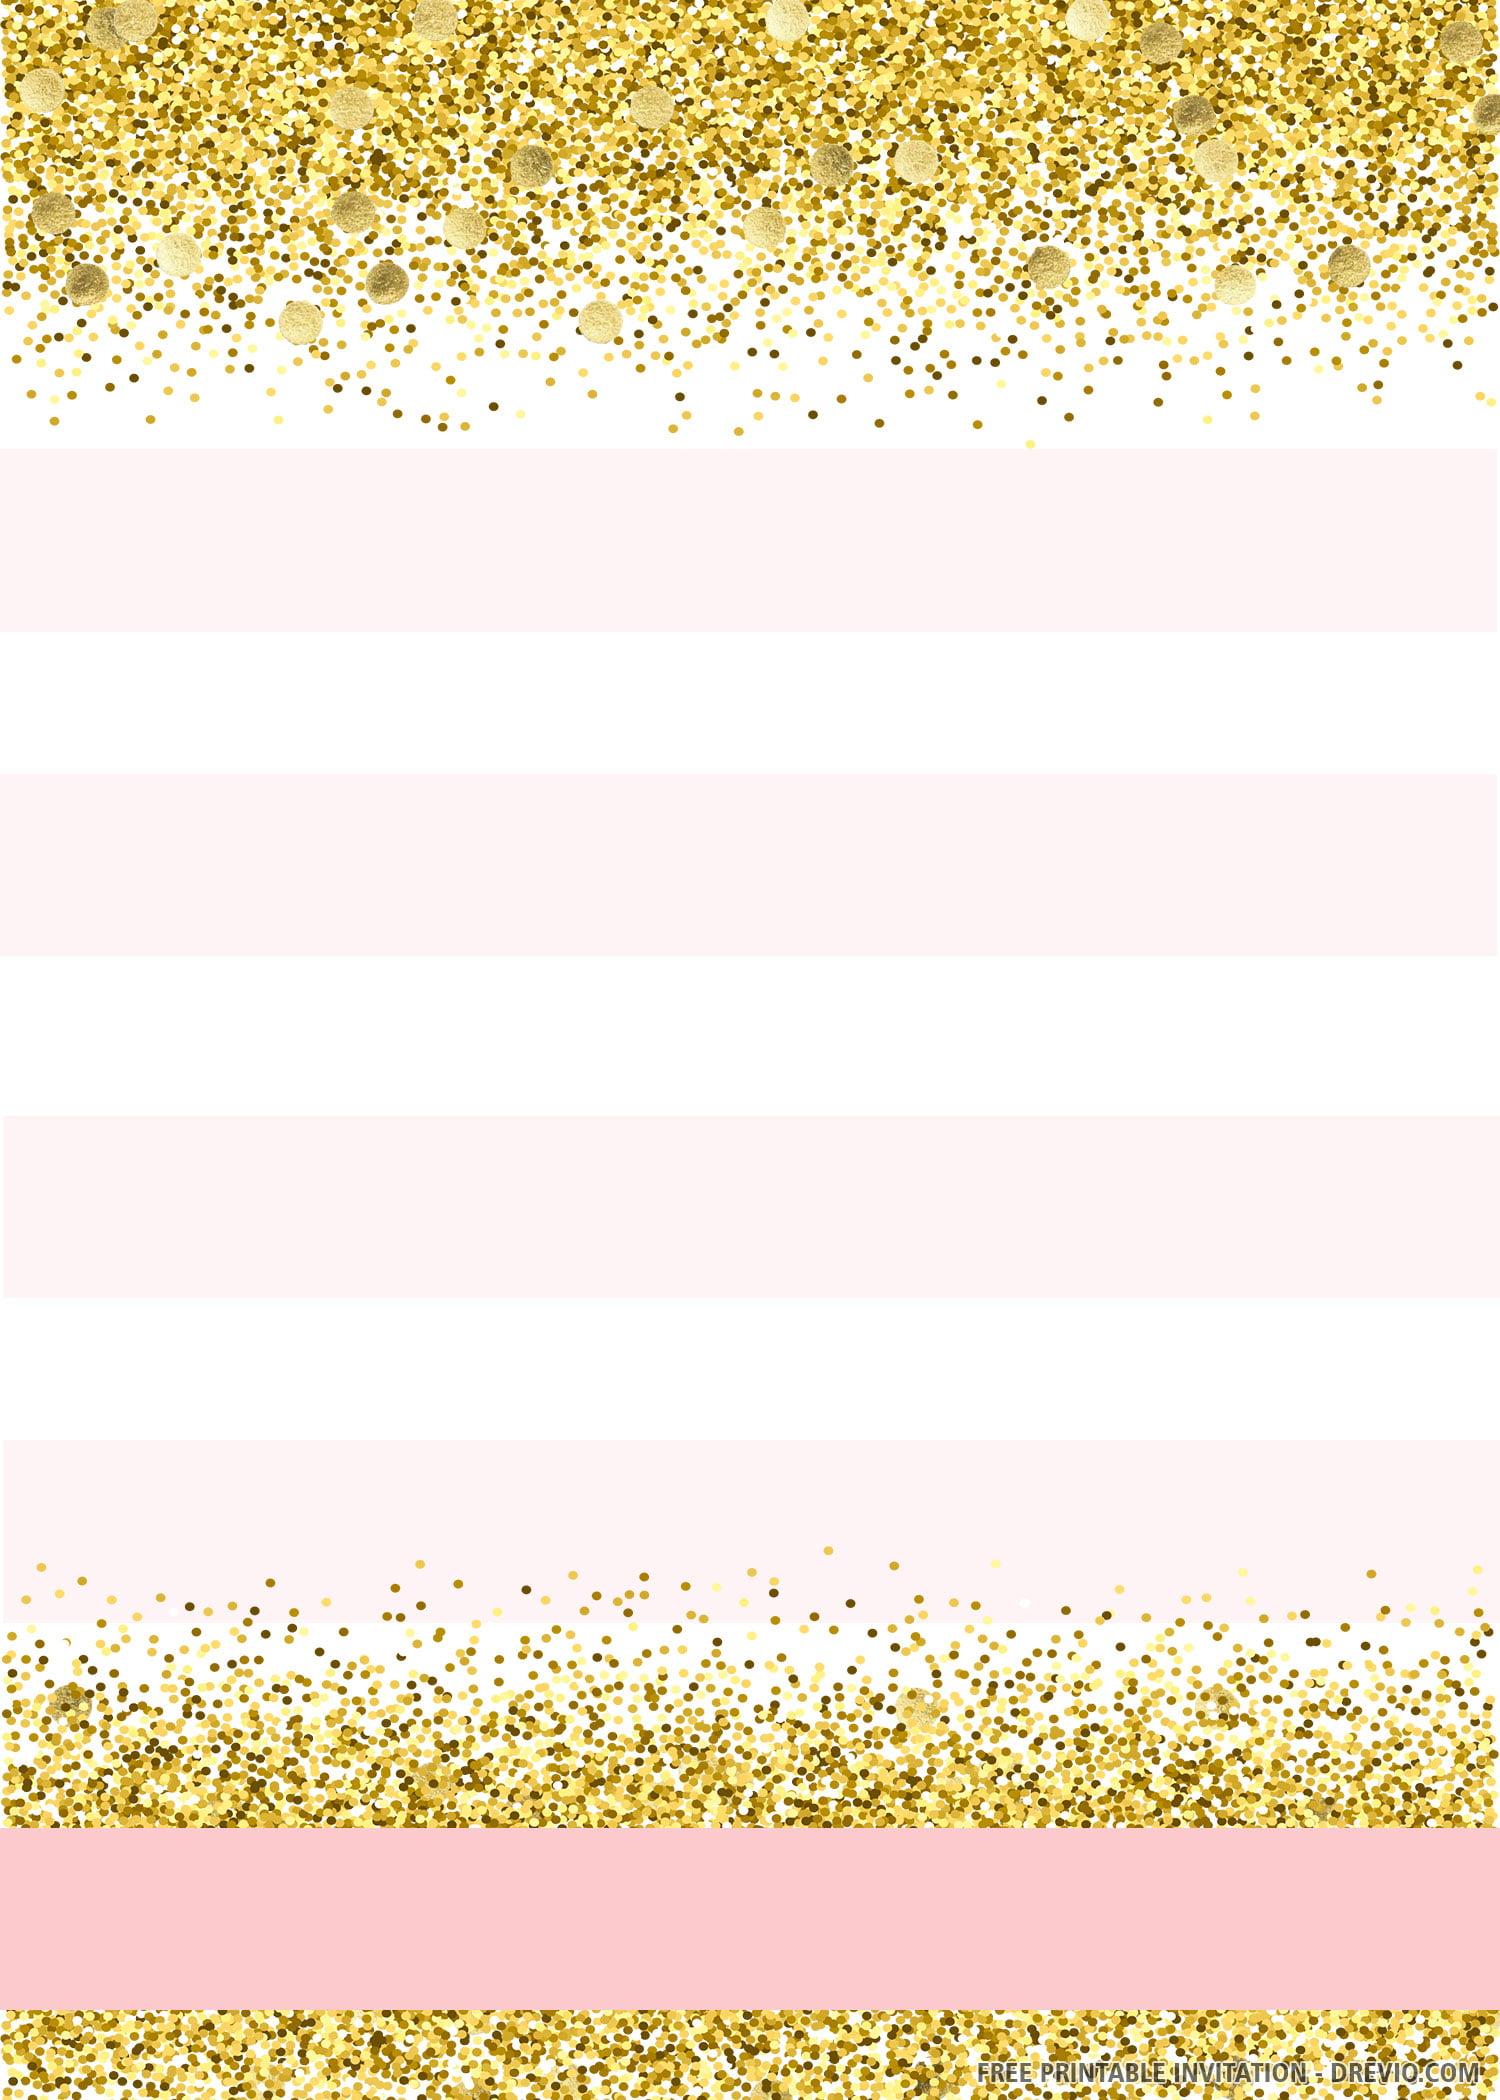 Free Printable Sparkle And Shine Birthday Invitation